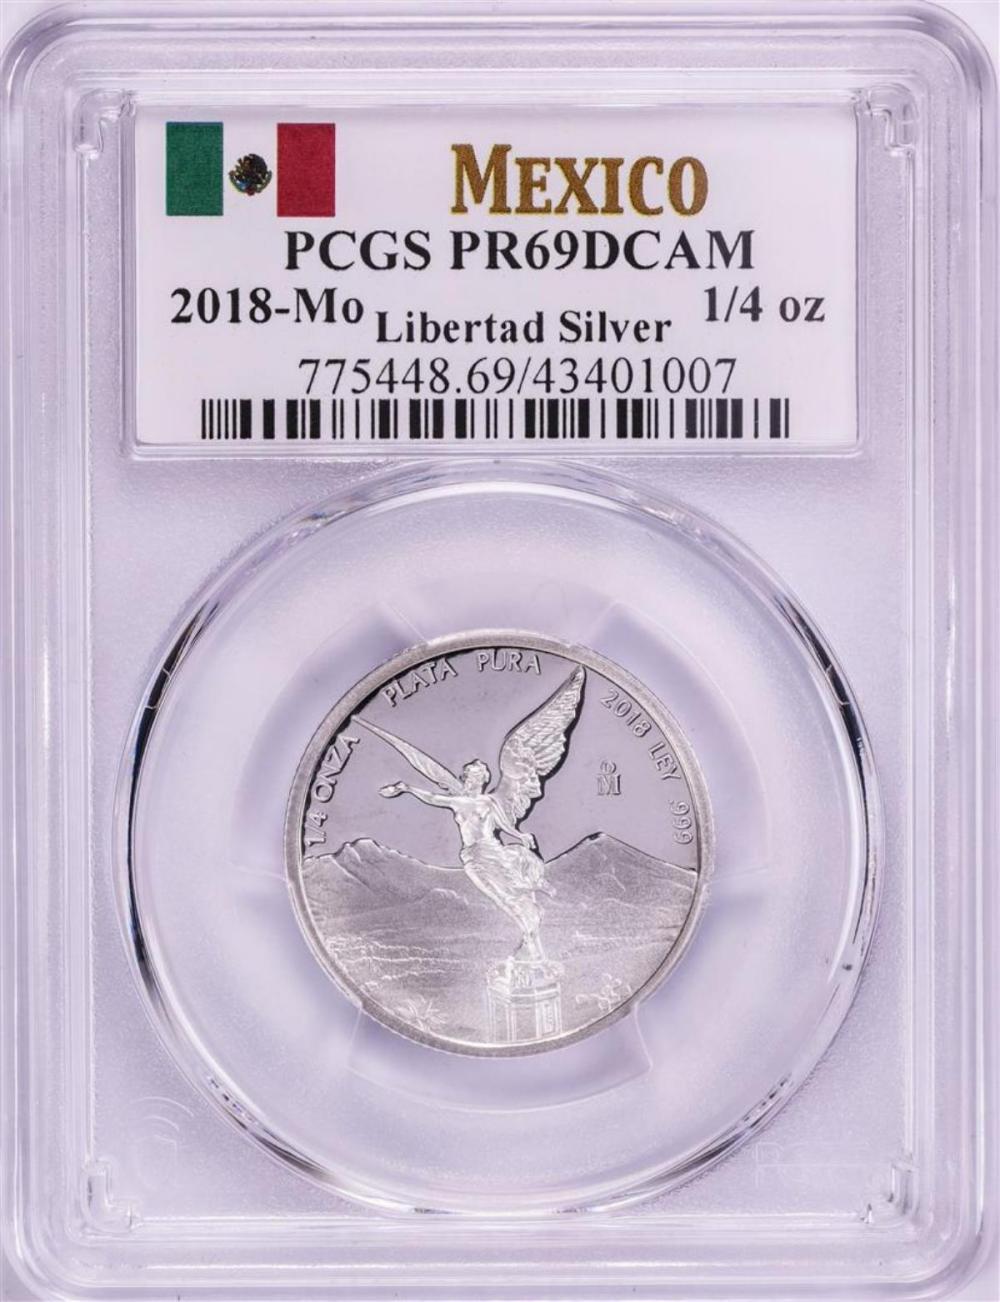 2018-Mo Mexico Proof 1/4 oz Silver Libertad Coin PCGS PR69DCAM